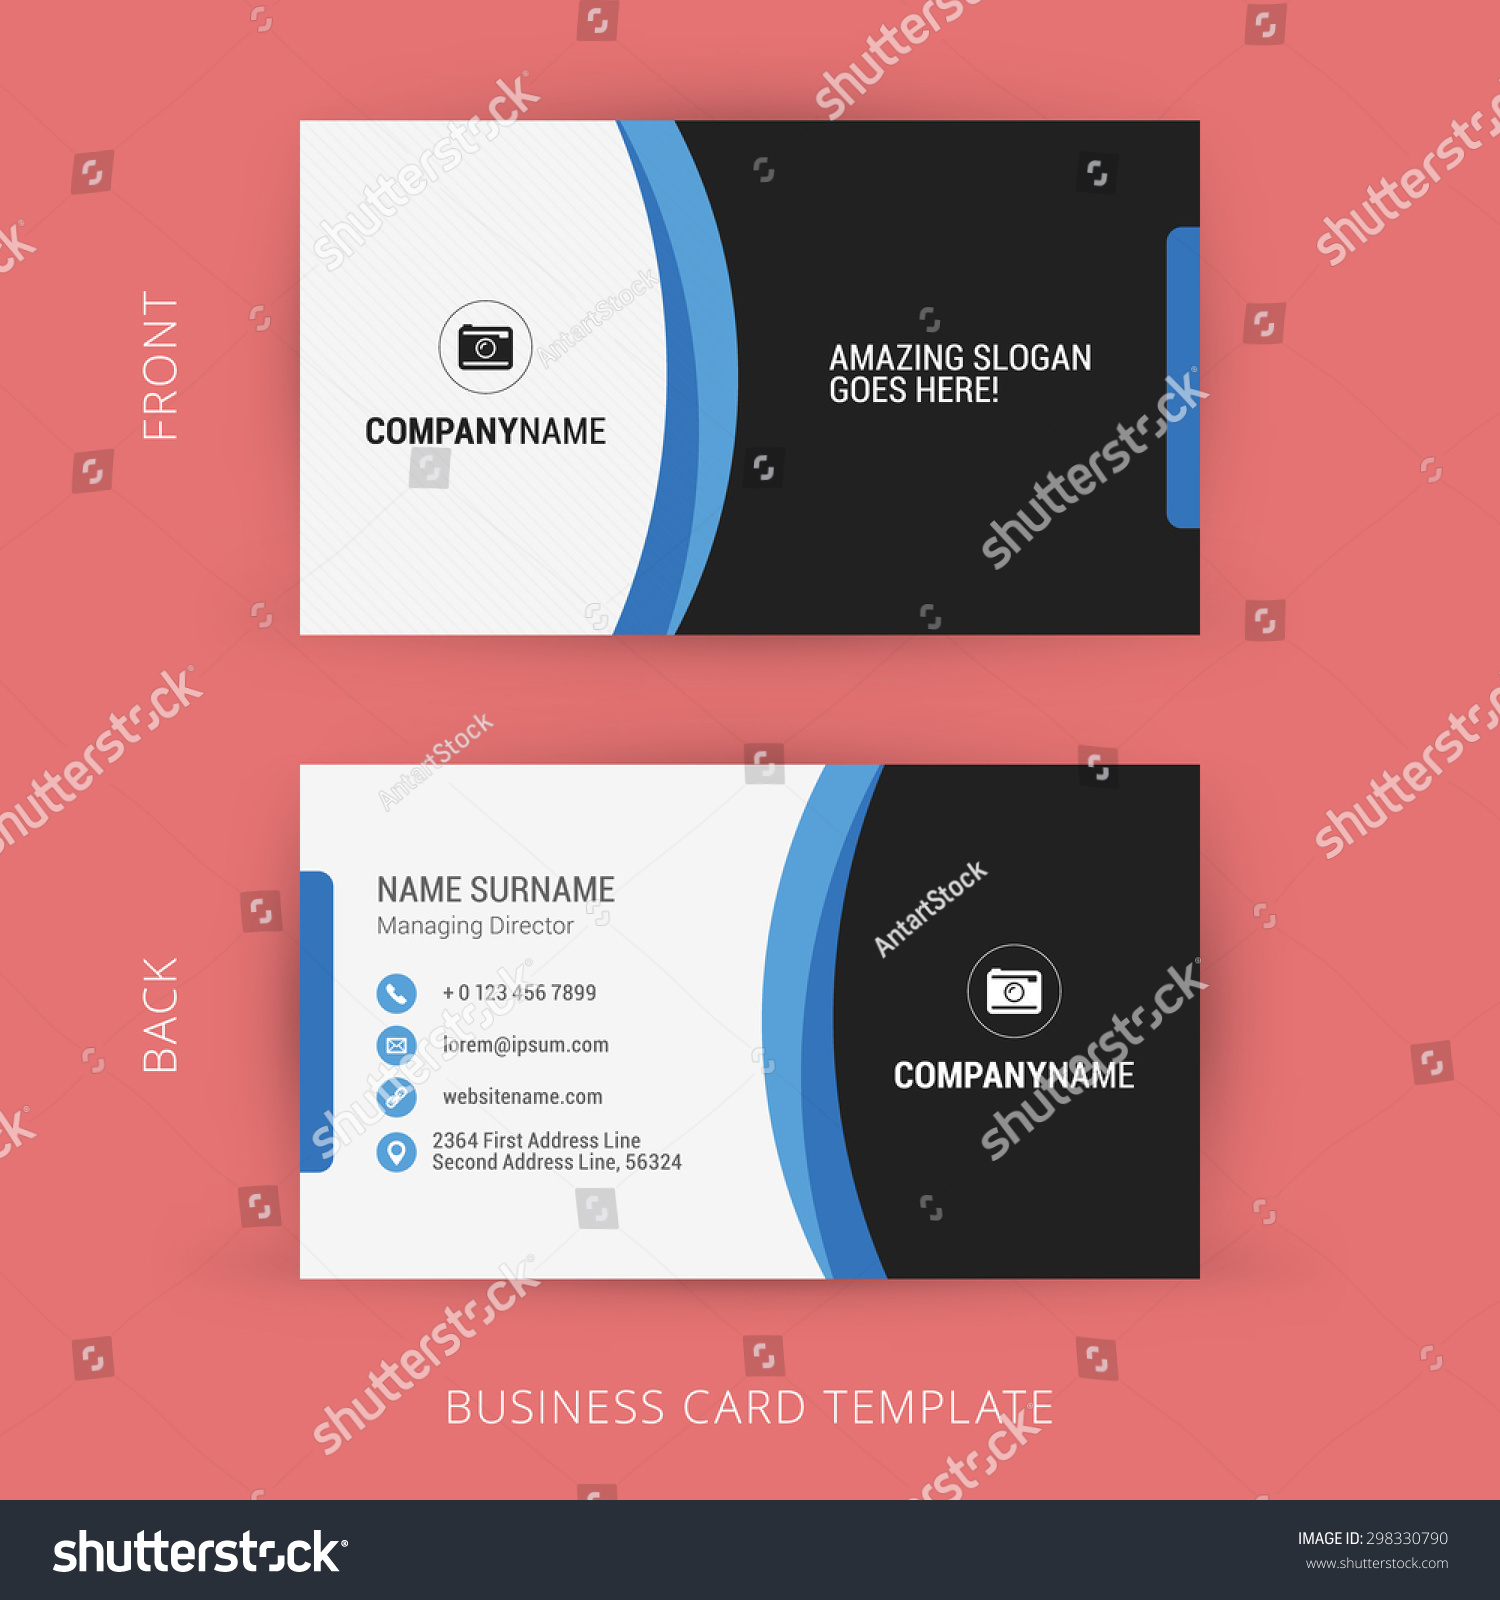 Creative clean business card template black stock vector 298330790 creative and clean business card template black and blue colors colourmoves